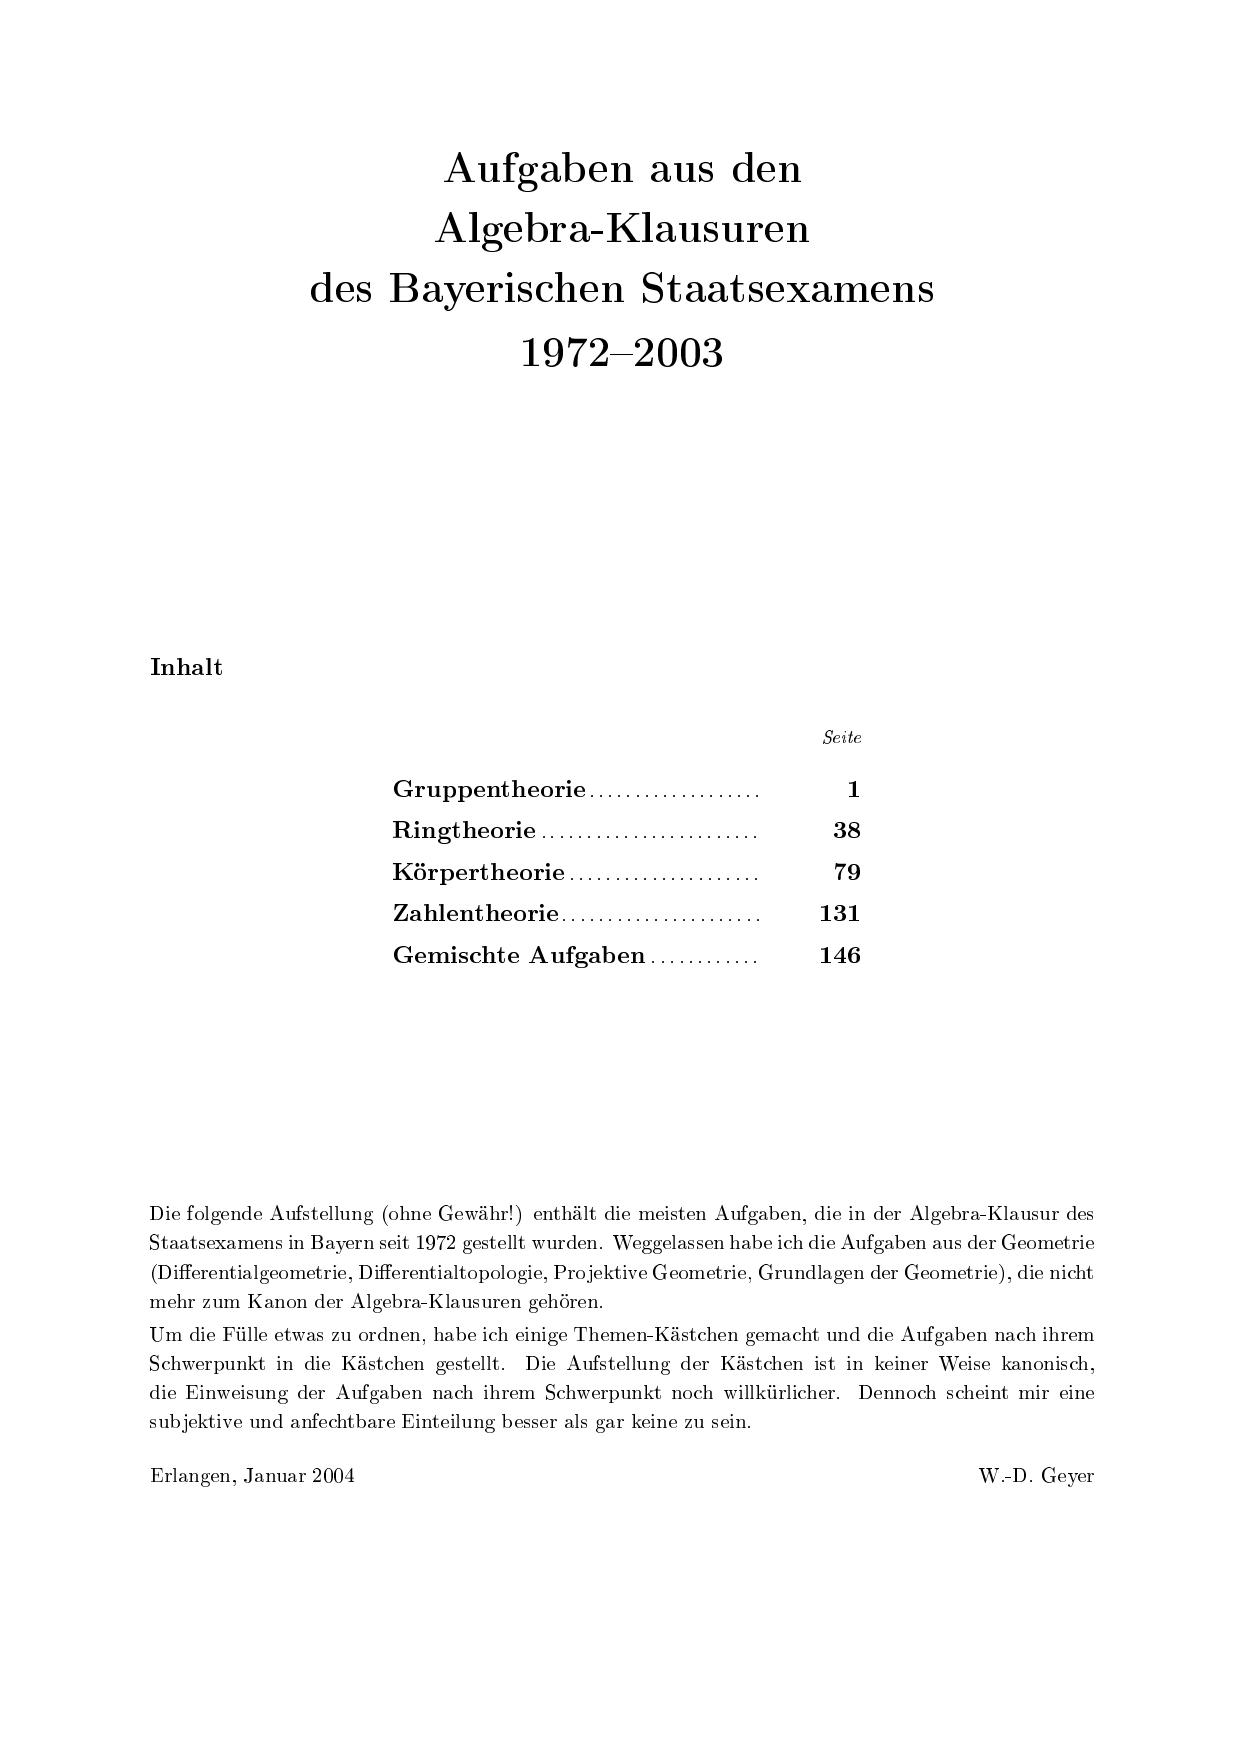 charakteristisches polynom nilpotente matrix